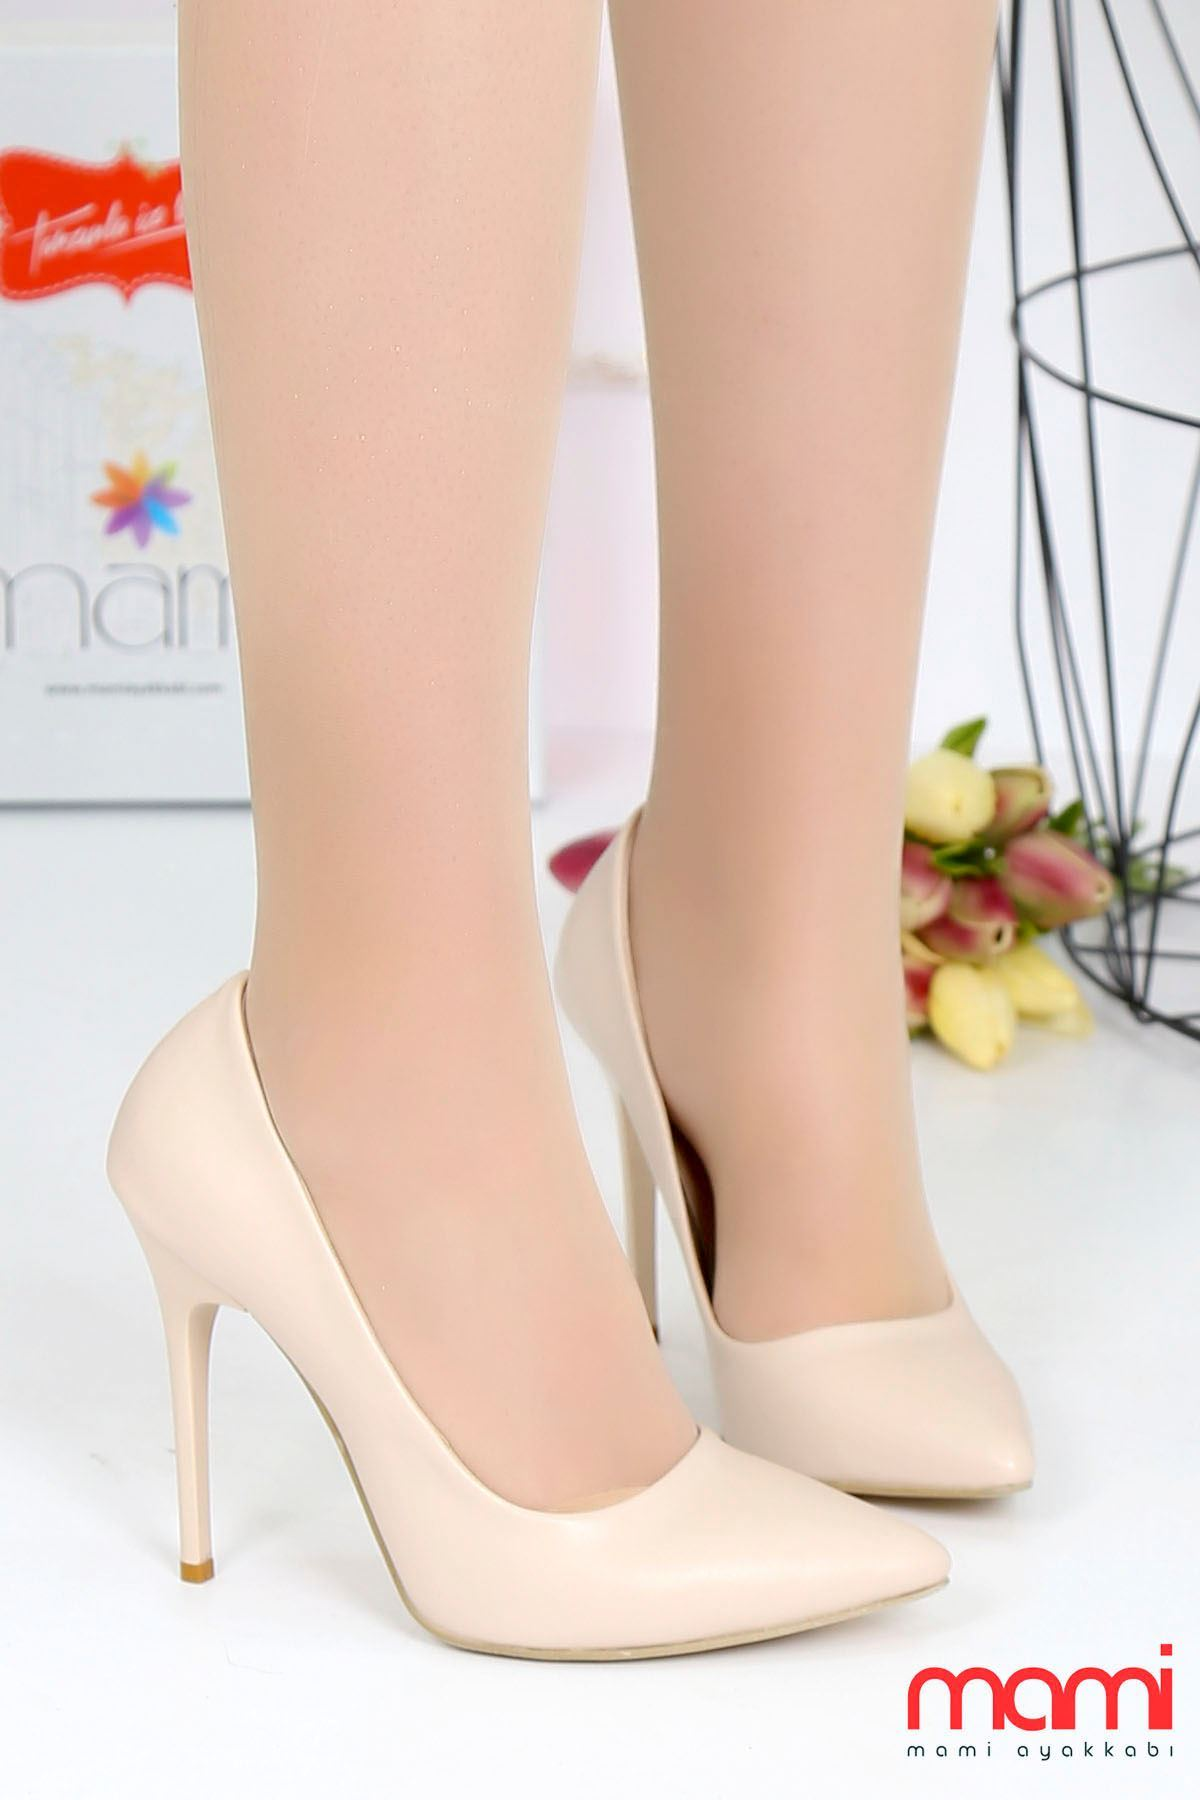 Mami- Stiletto Ayakkabı Ten Rengi Deri